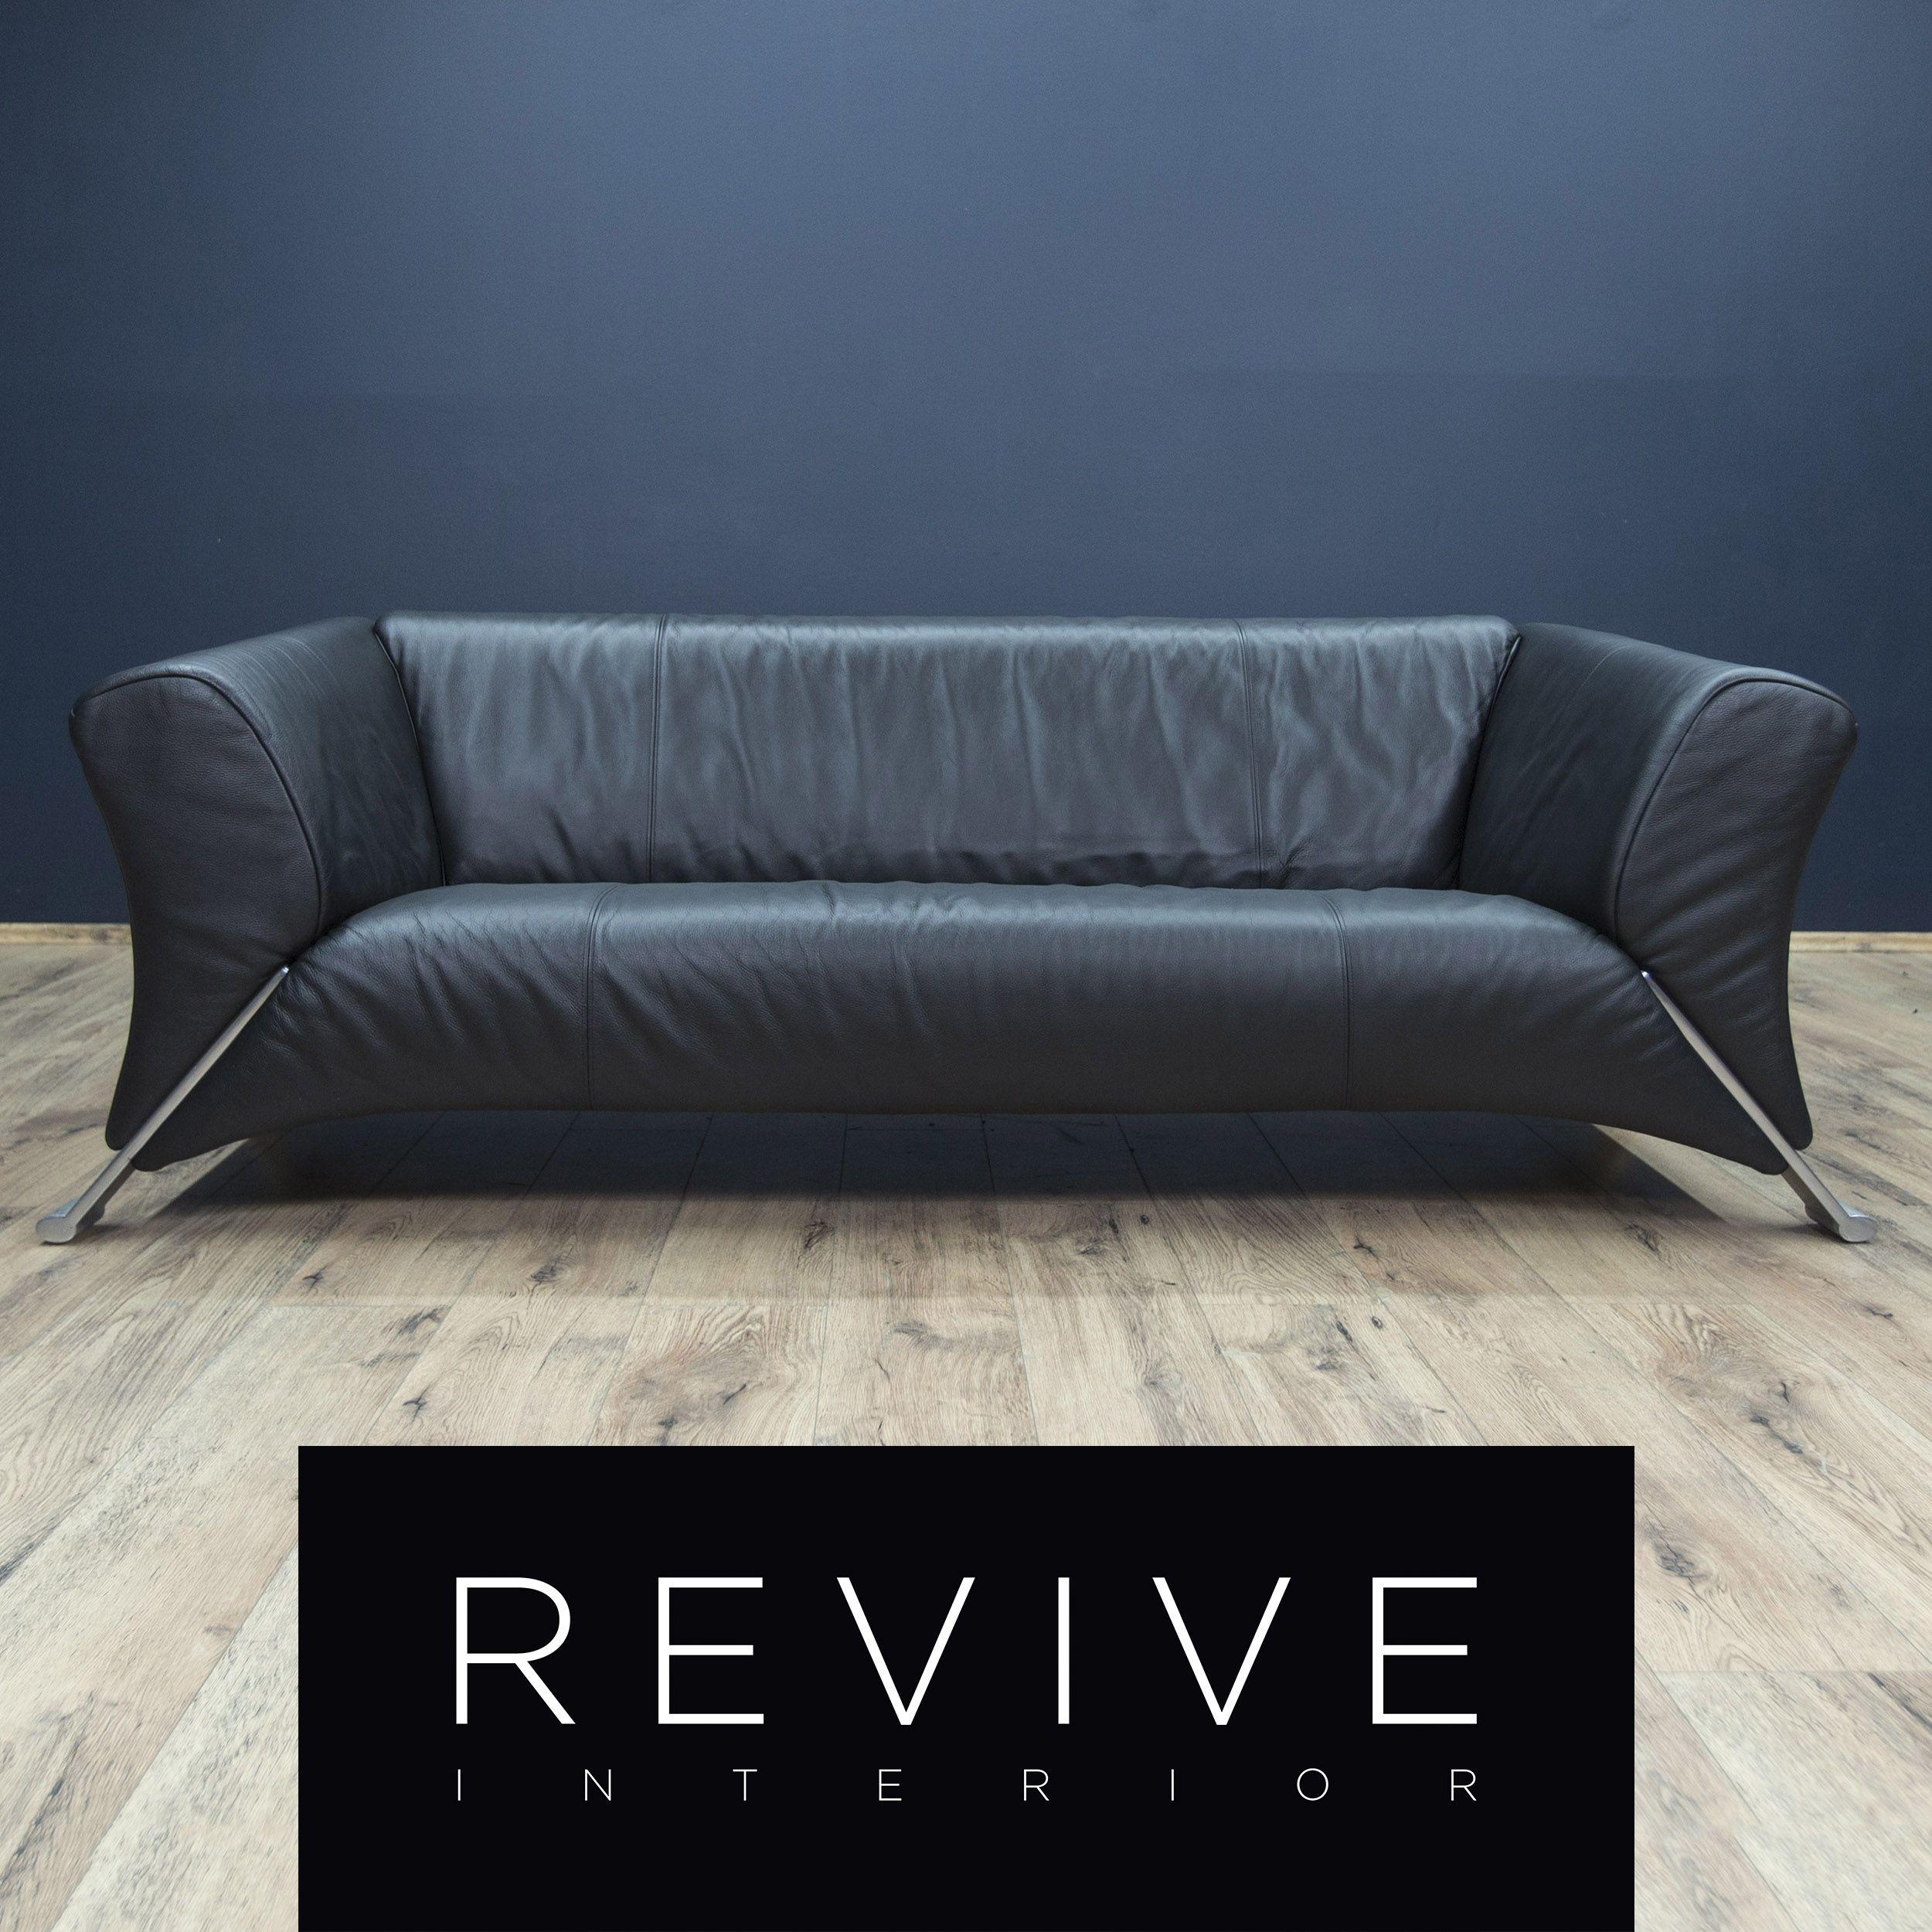 Rolf Benz 322 Designer Sofa Schwarz Leder Dreisitzer Couch Modern Echtleder  #1879 | Revive Interior